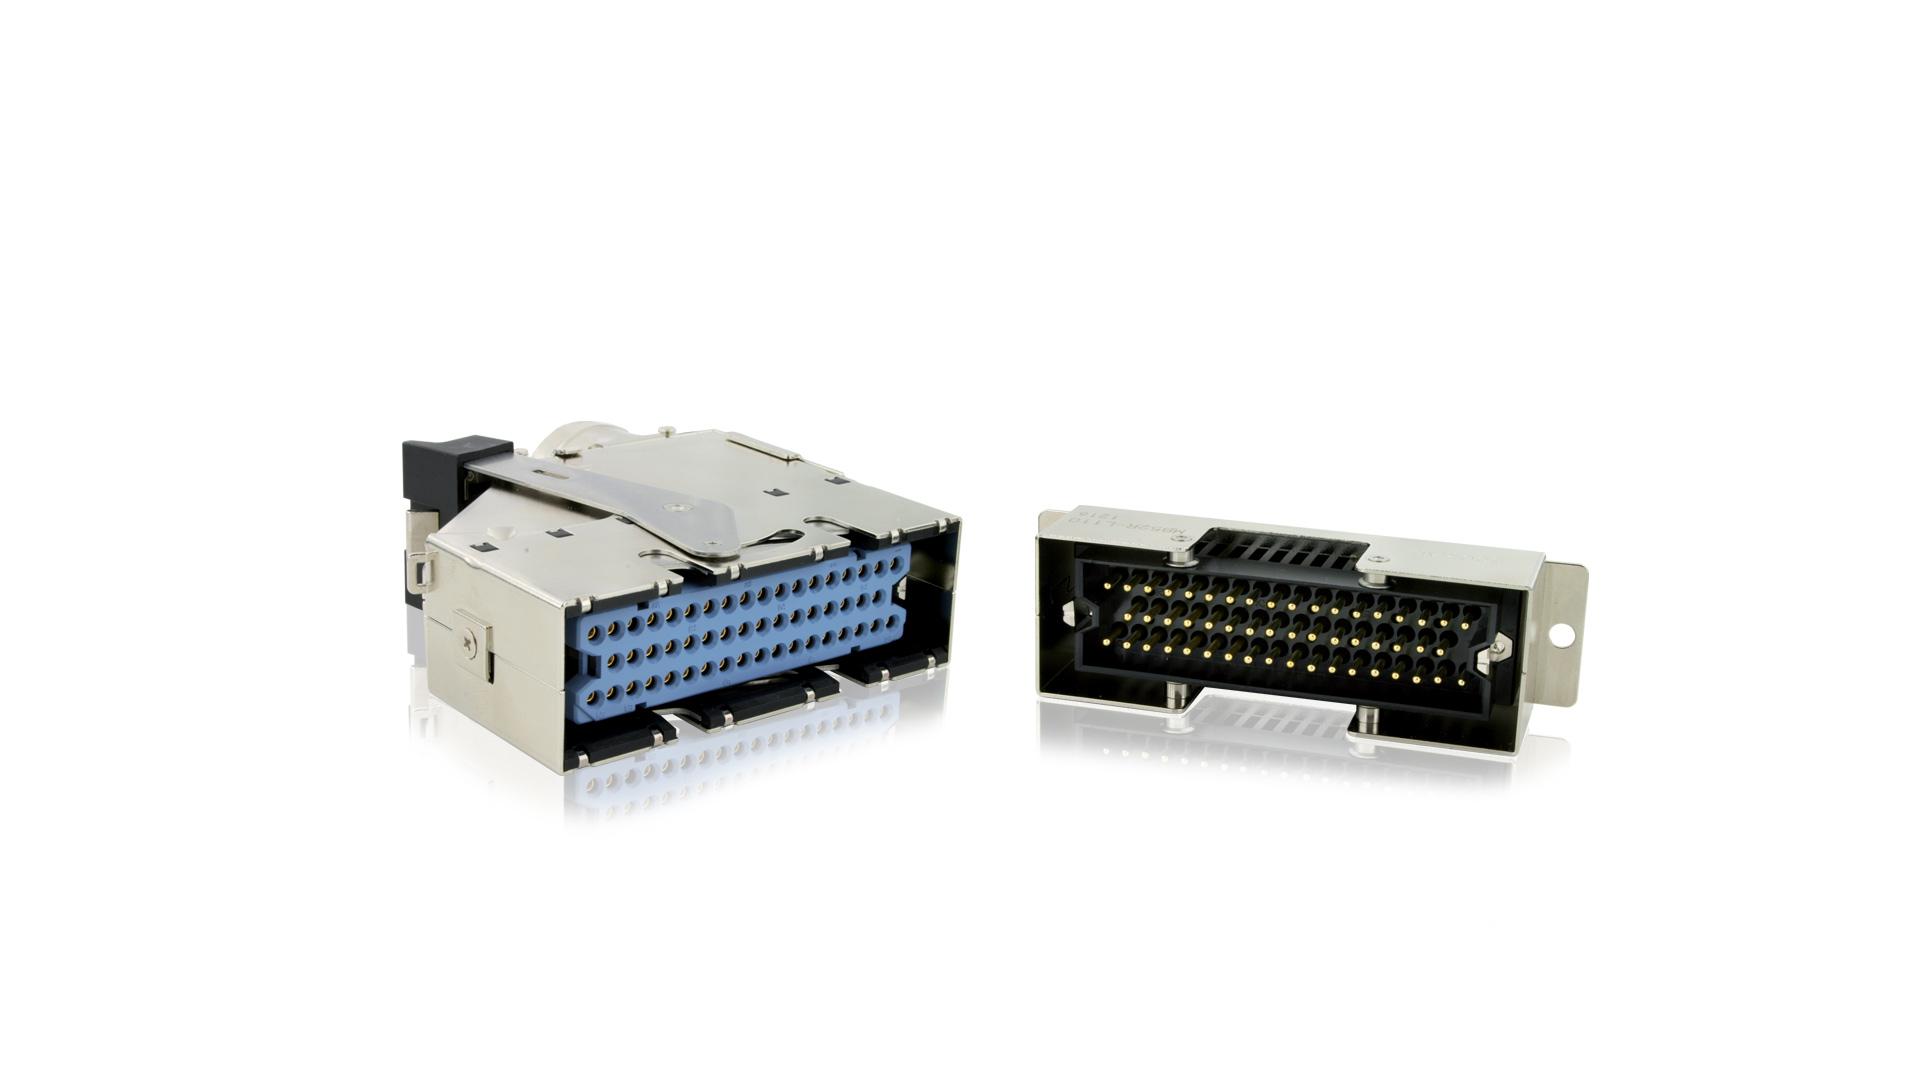 High density rectangular connector